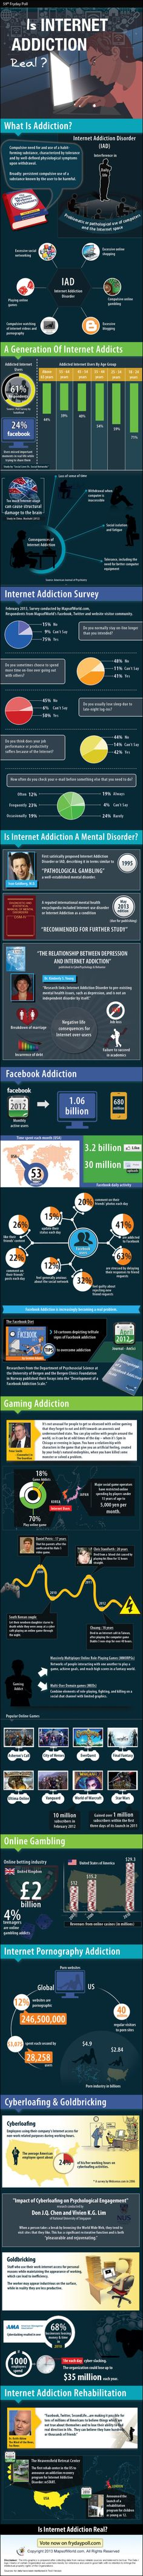 internet-addiction-facts-infographic (1)